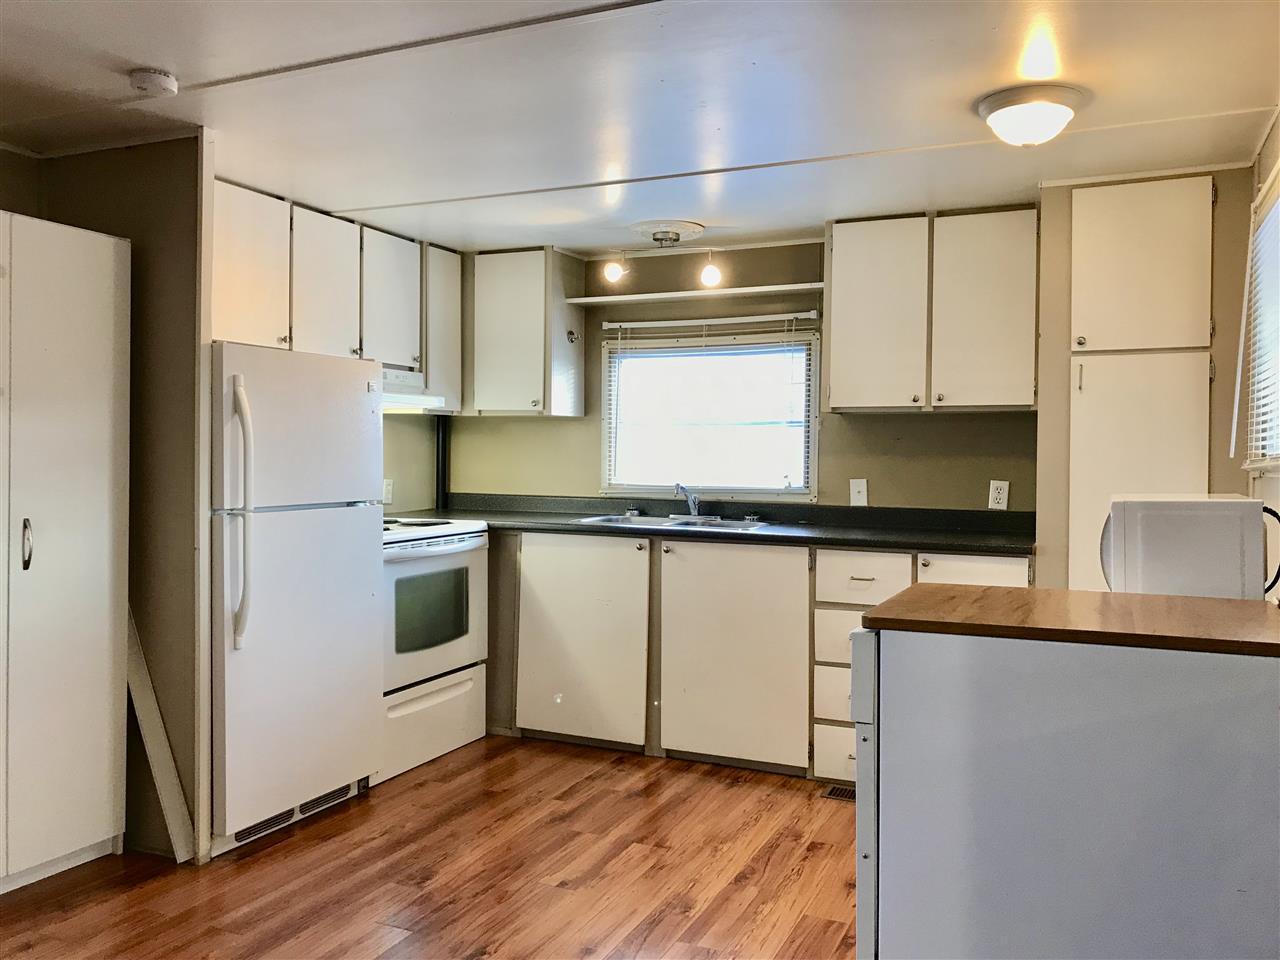 Property, 2 bed, 1 bath, at $26,000